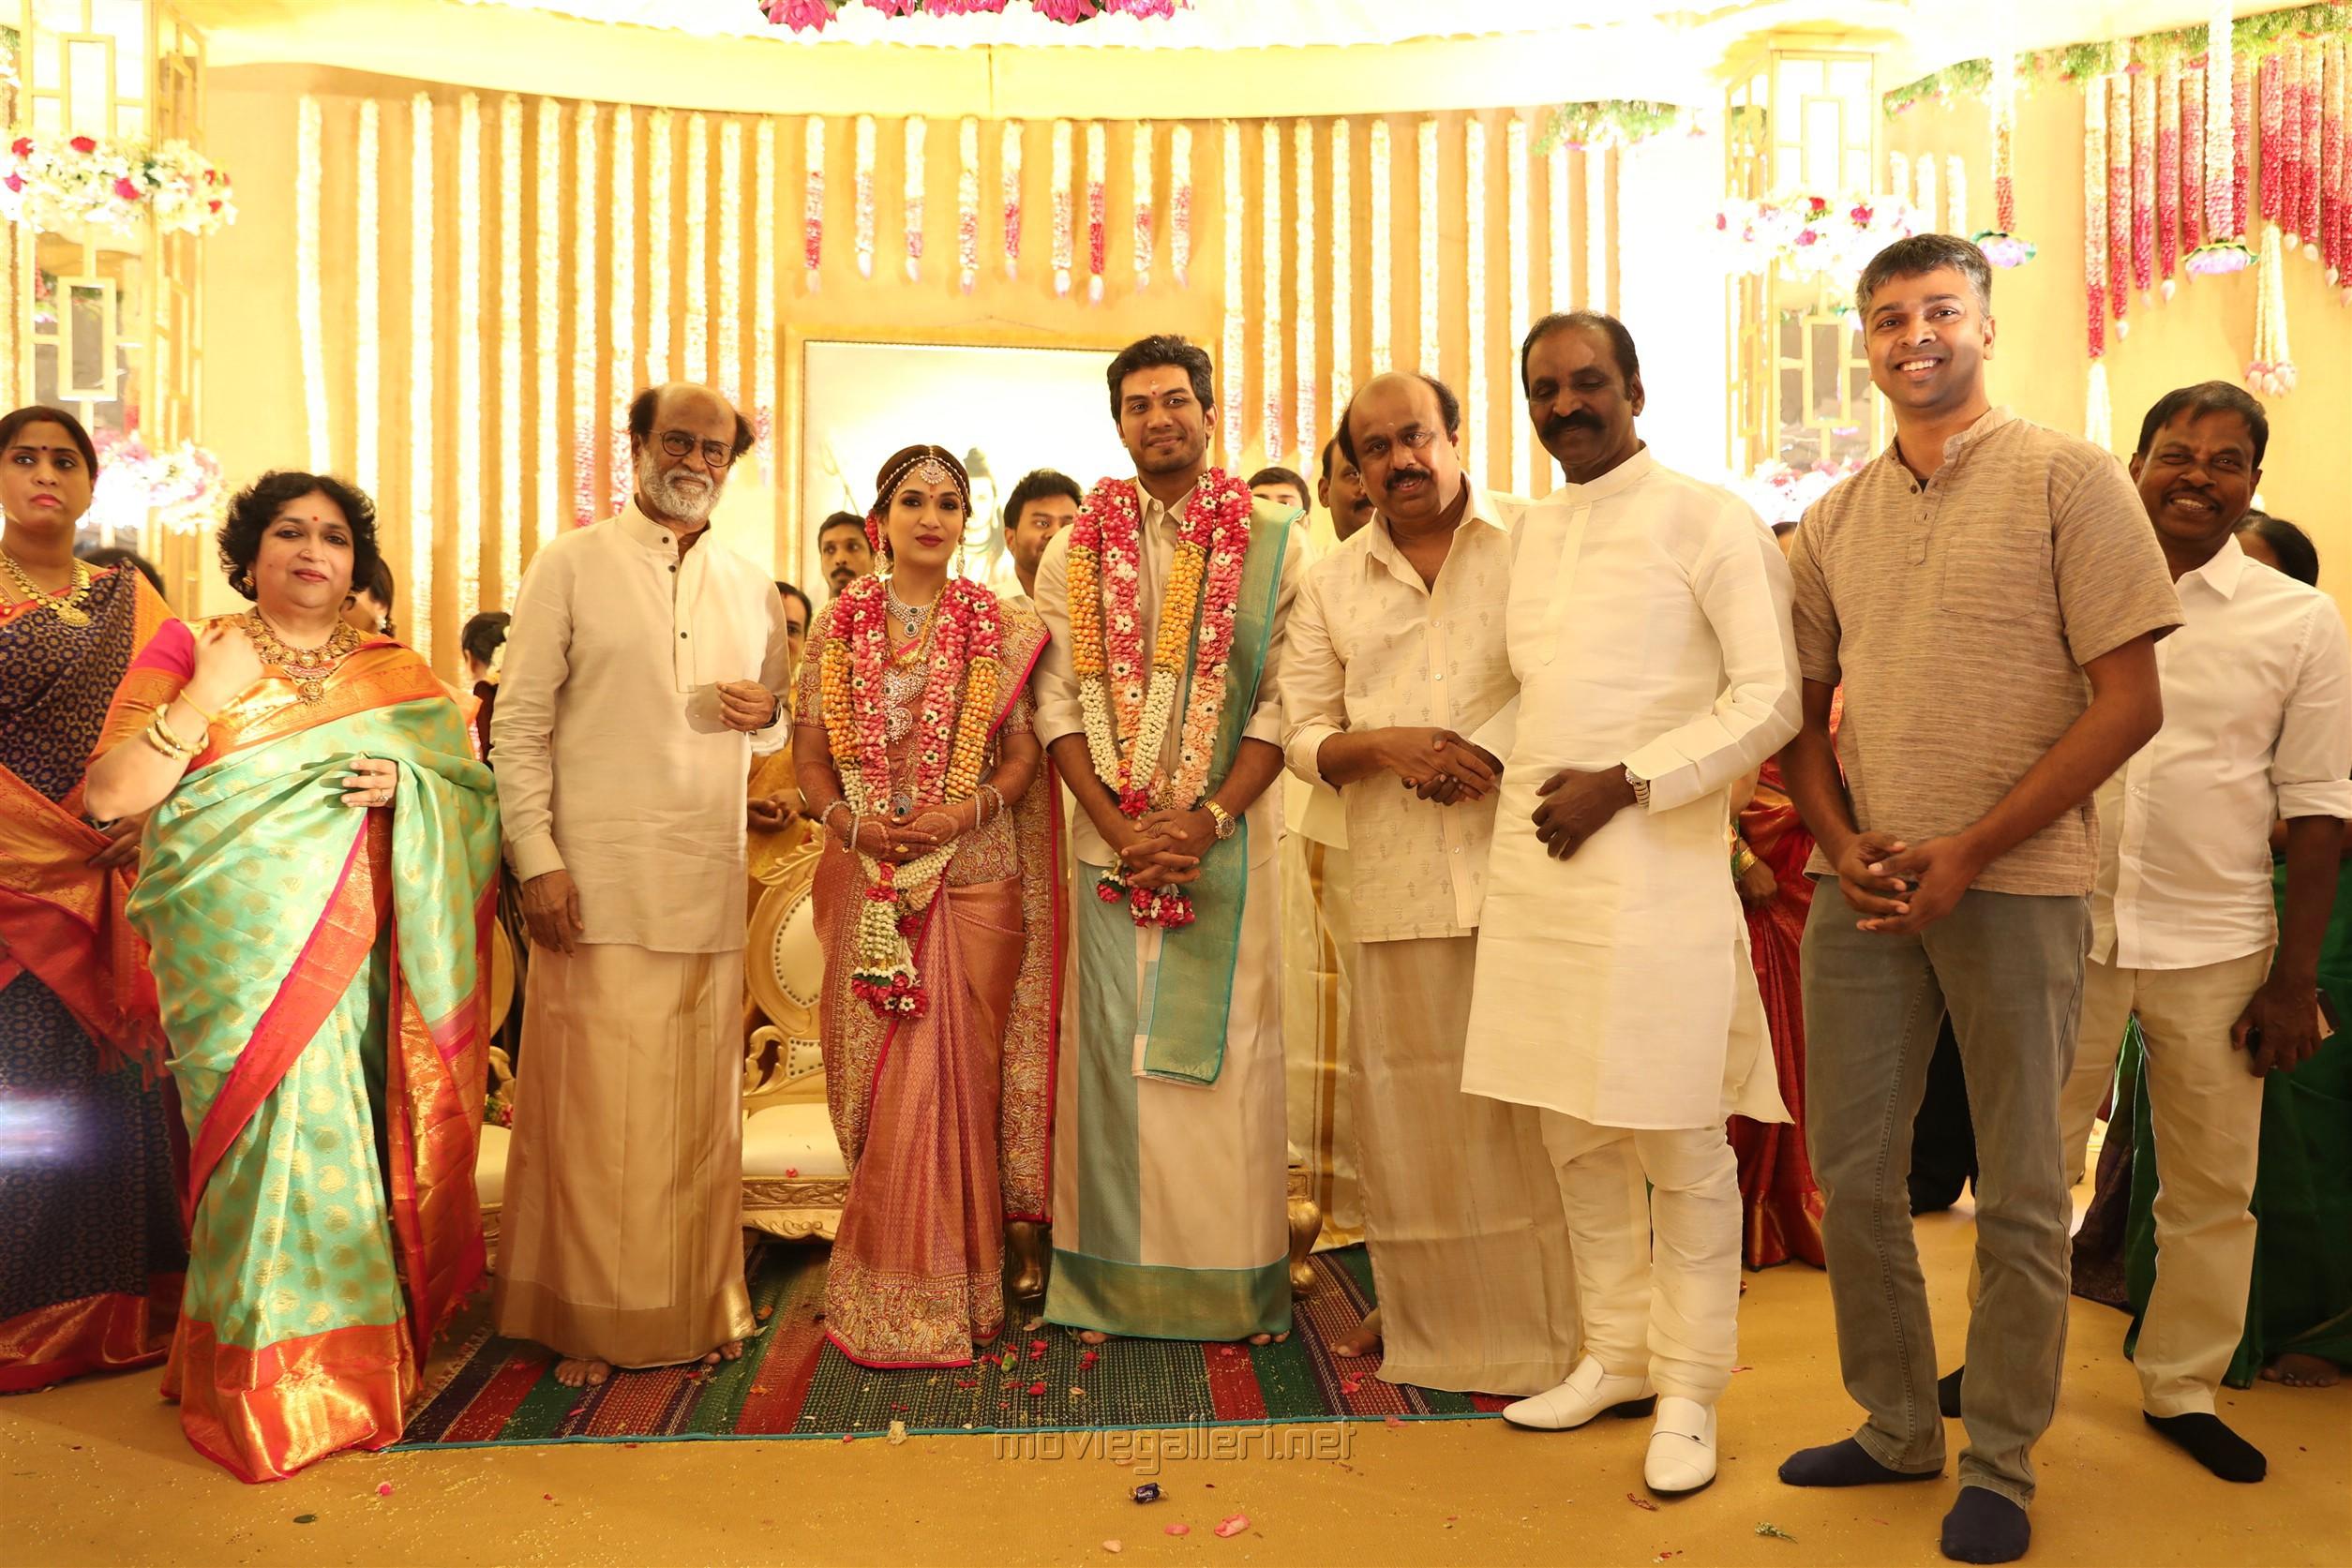 Vairamuthu @ Vishagan Soundarya Rajinikanth Marriage Photos HD